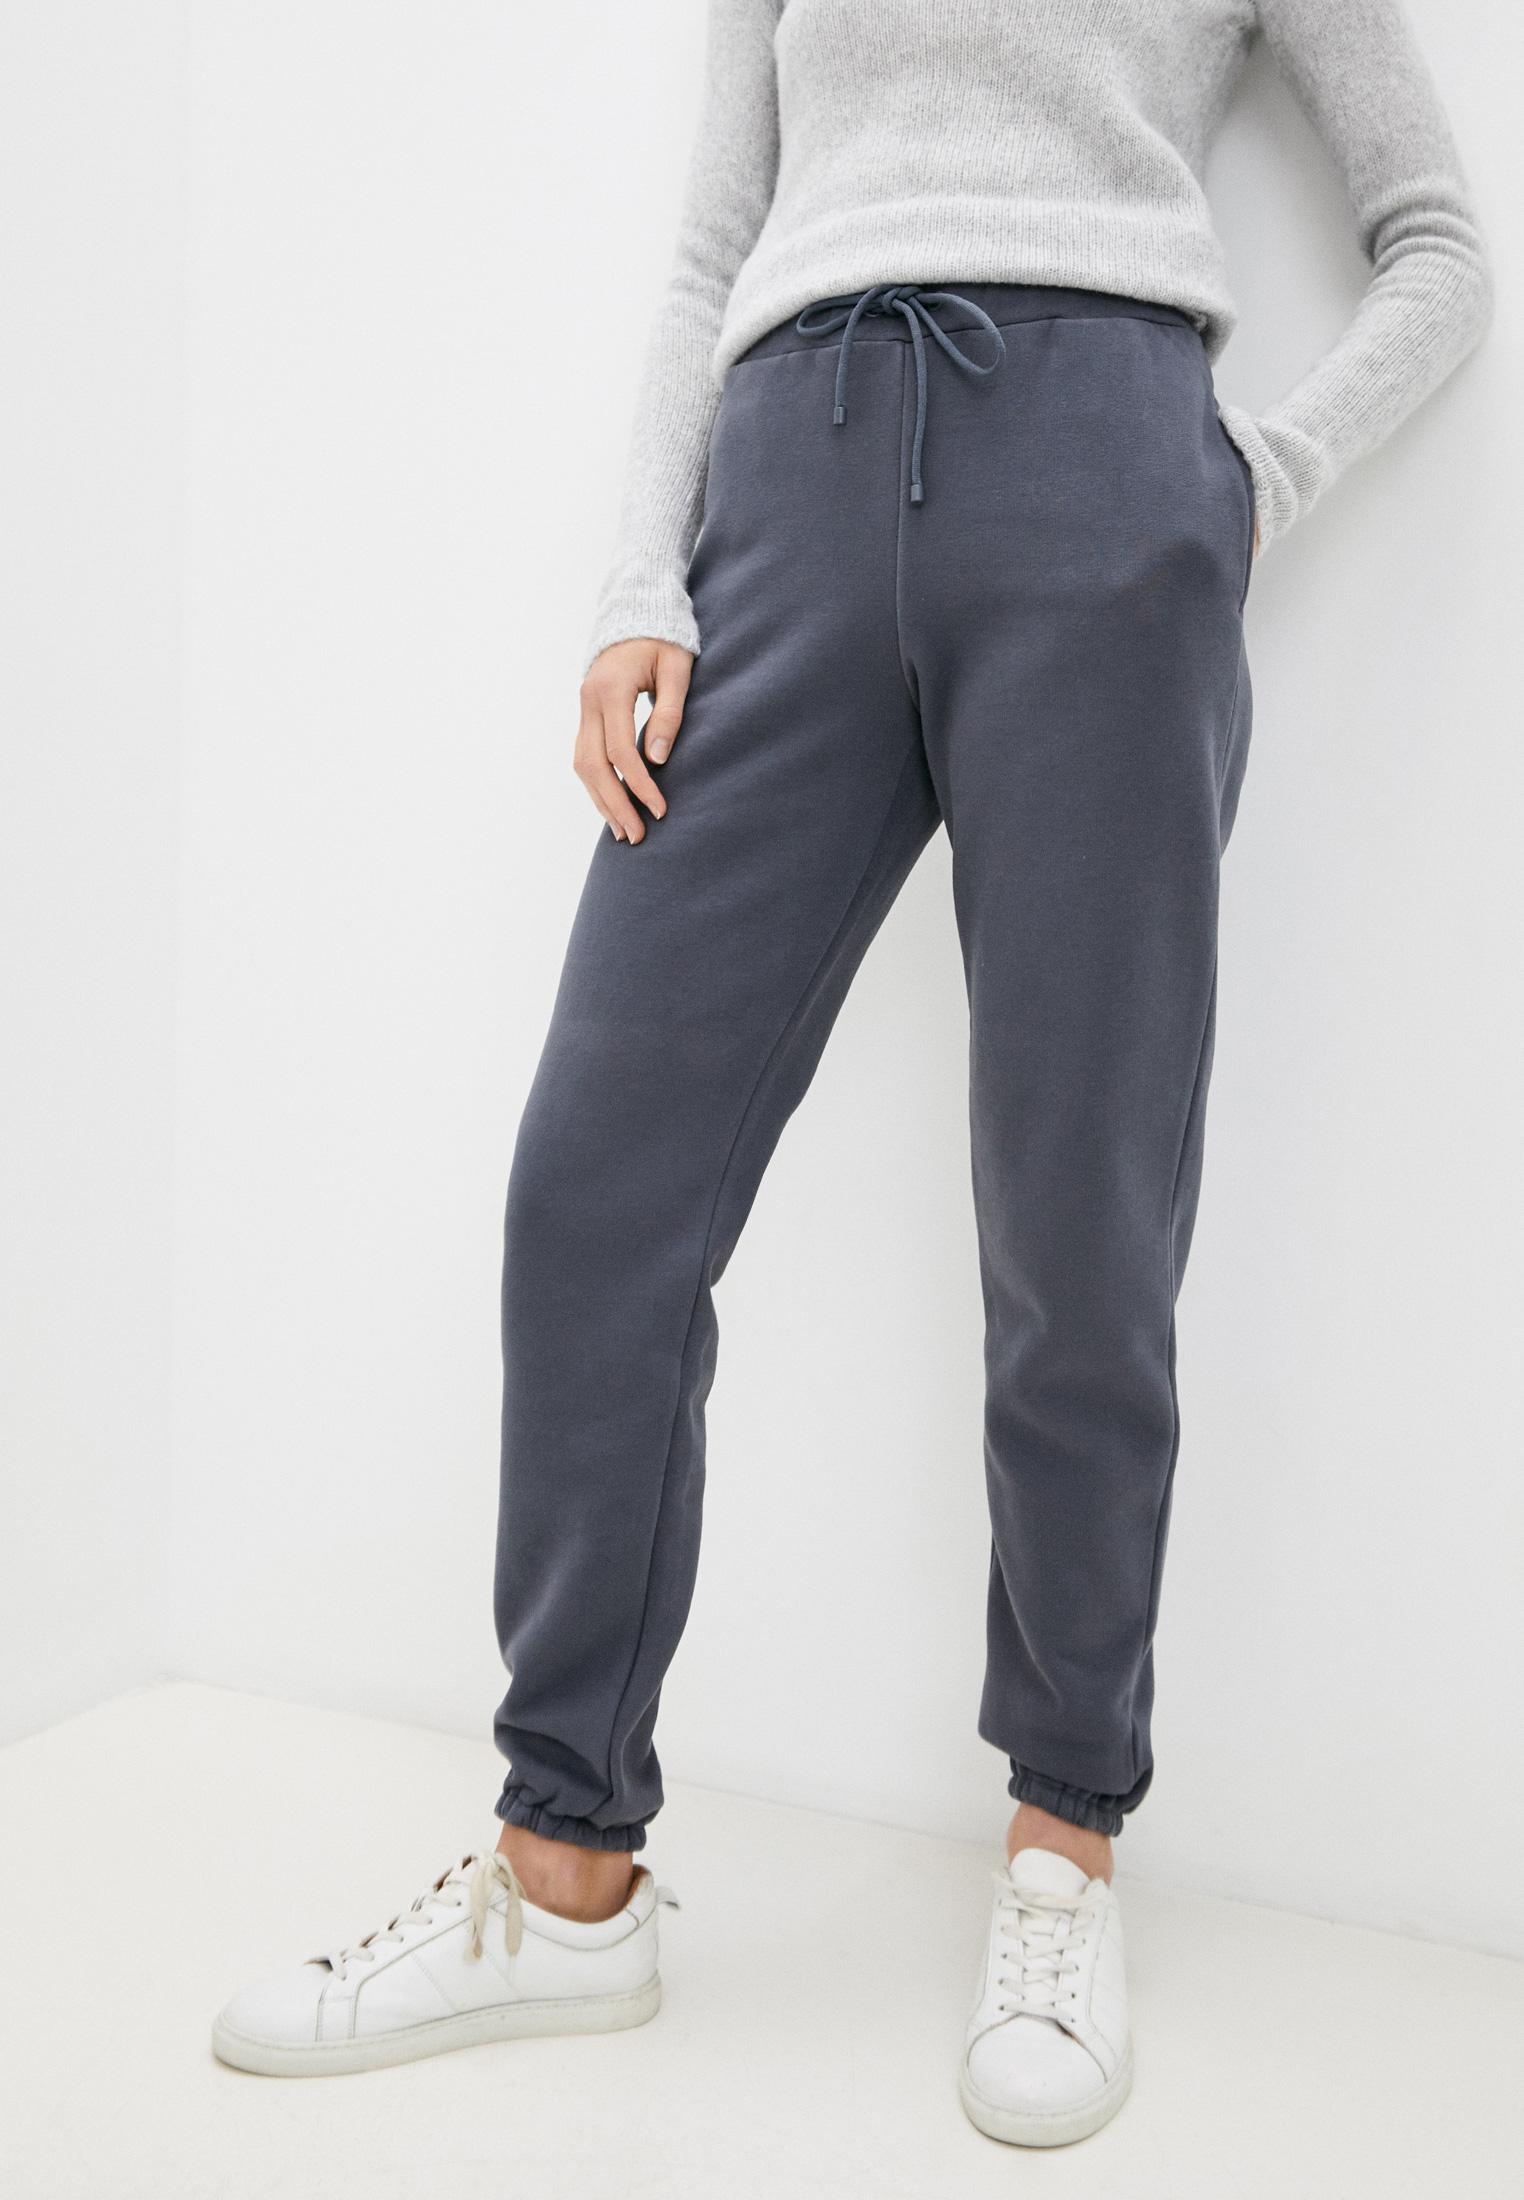 Женские спортивные брюки Max Mara Leisure Брюки спортивные Max Mara Leisure